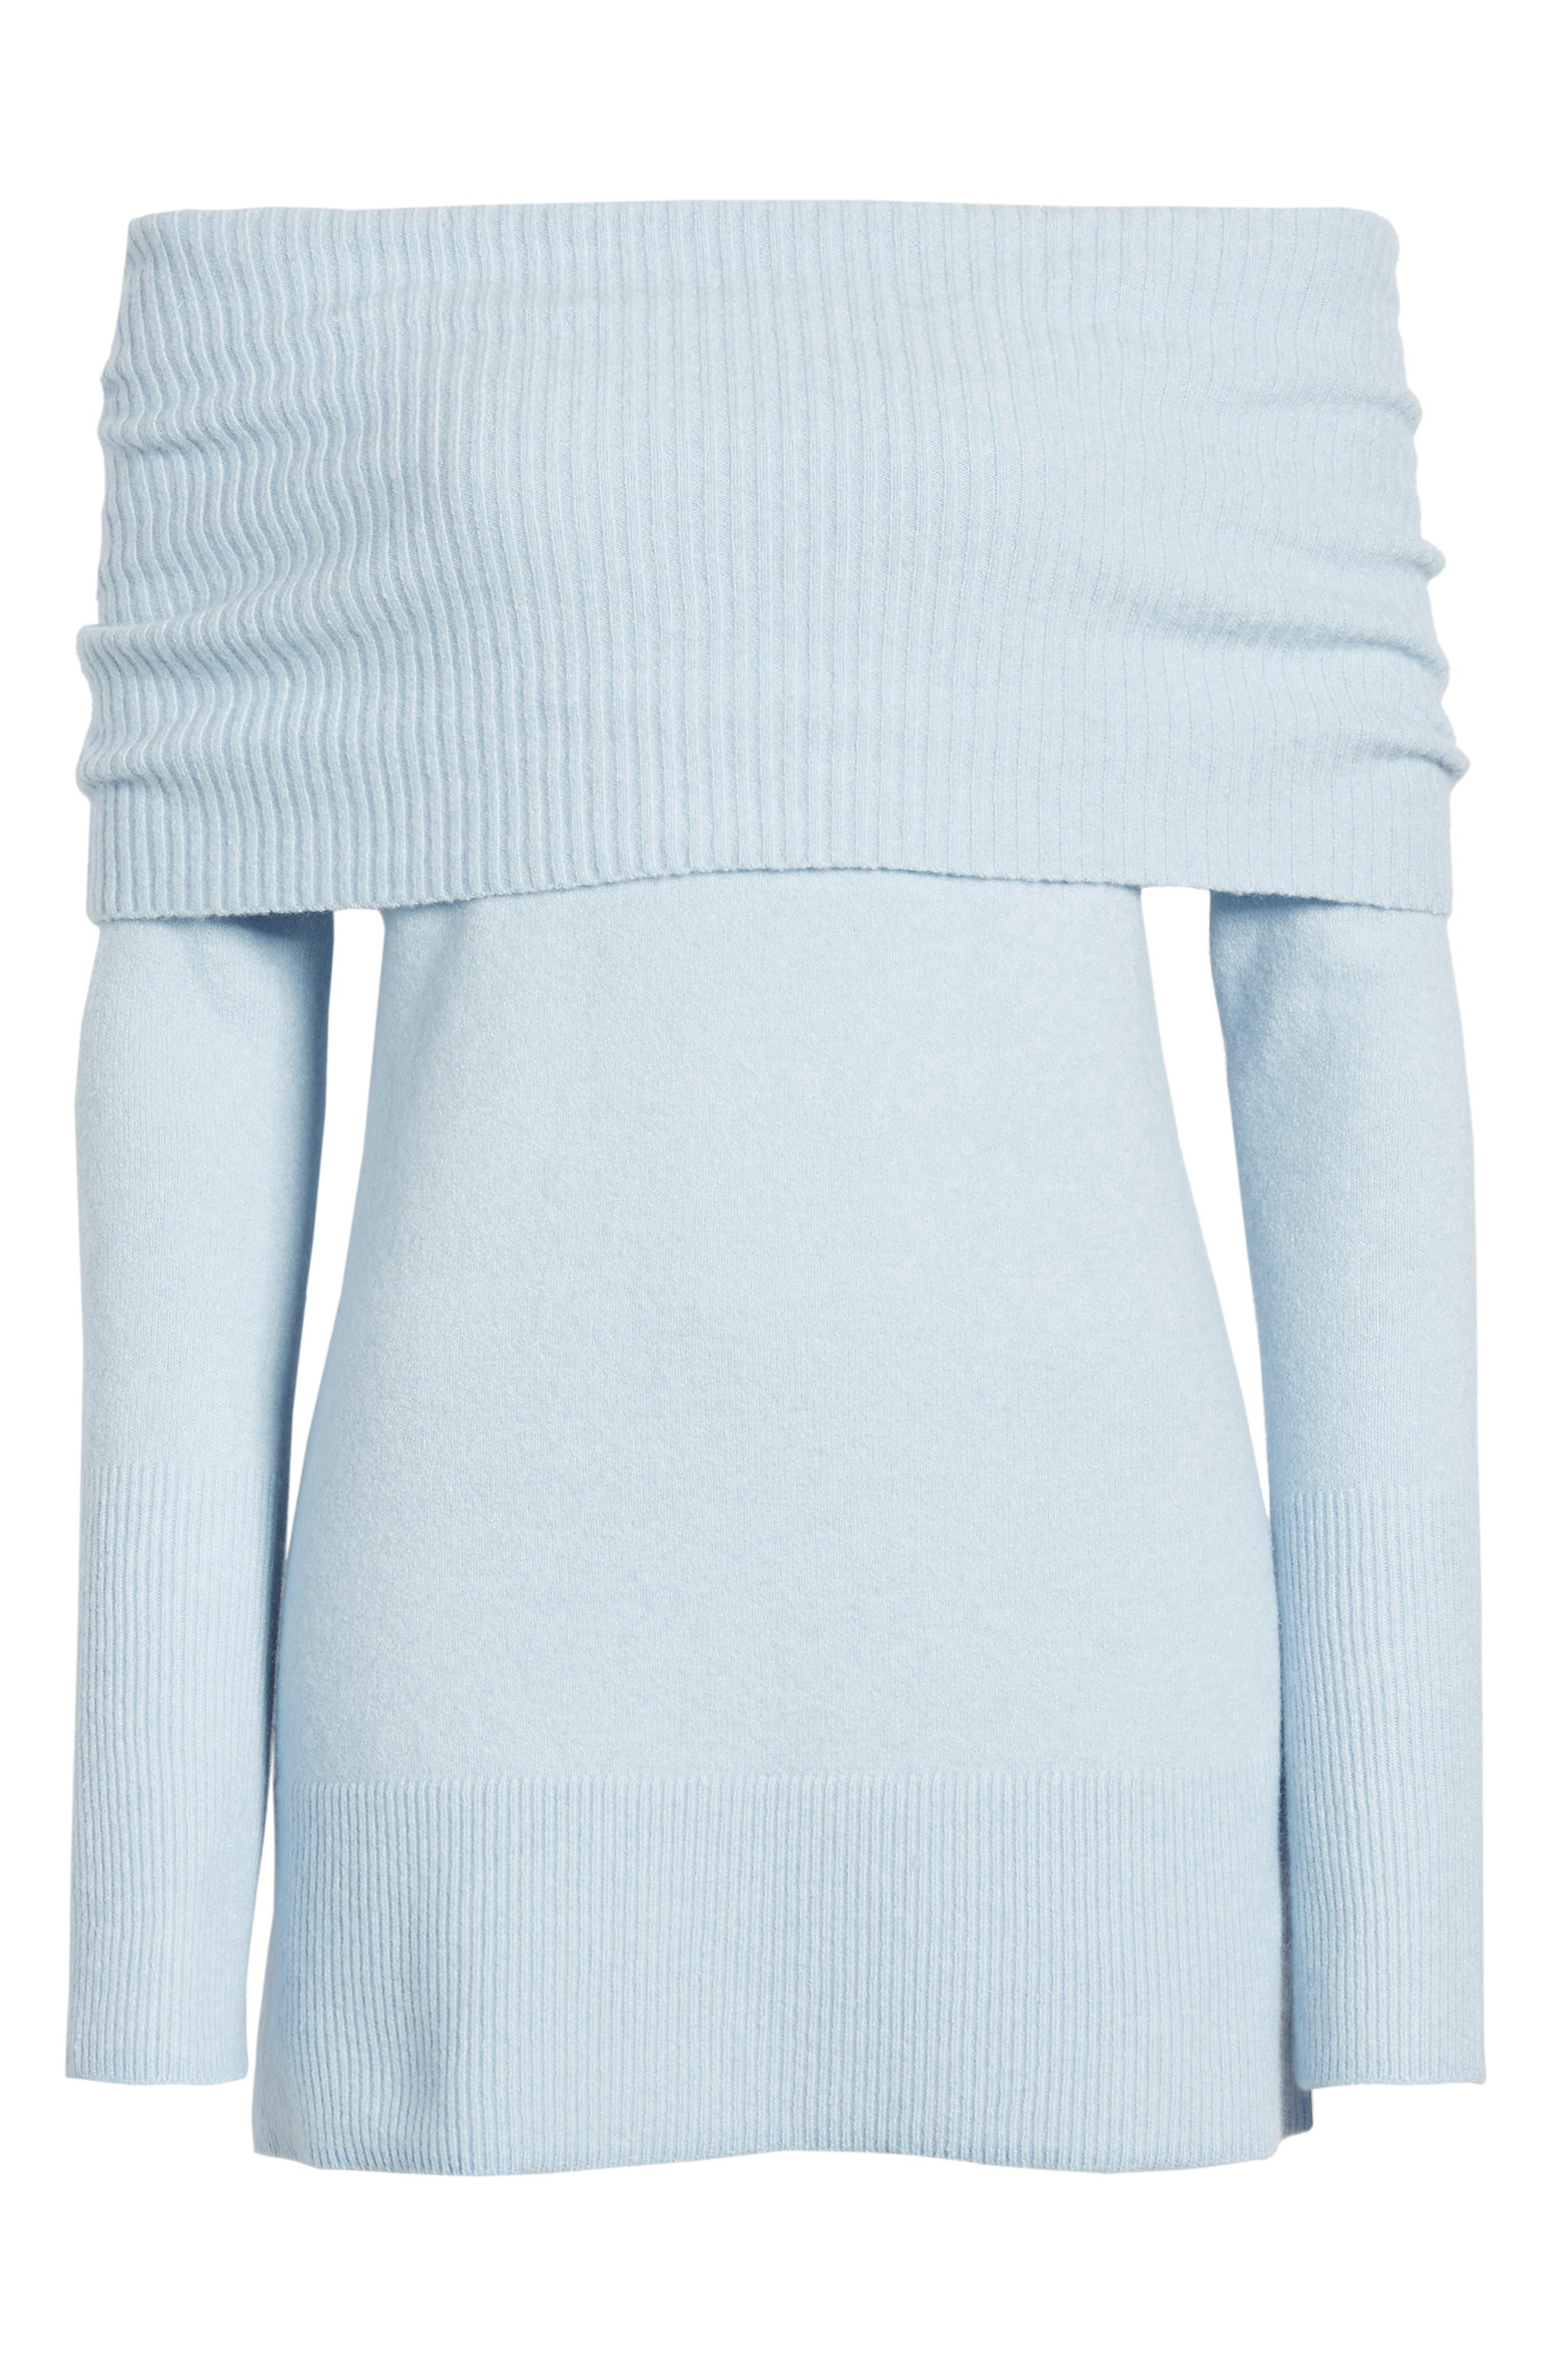 Convertible Neck Sweater,                             Alternate thumbnail 6, color,                             BLUE FOG